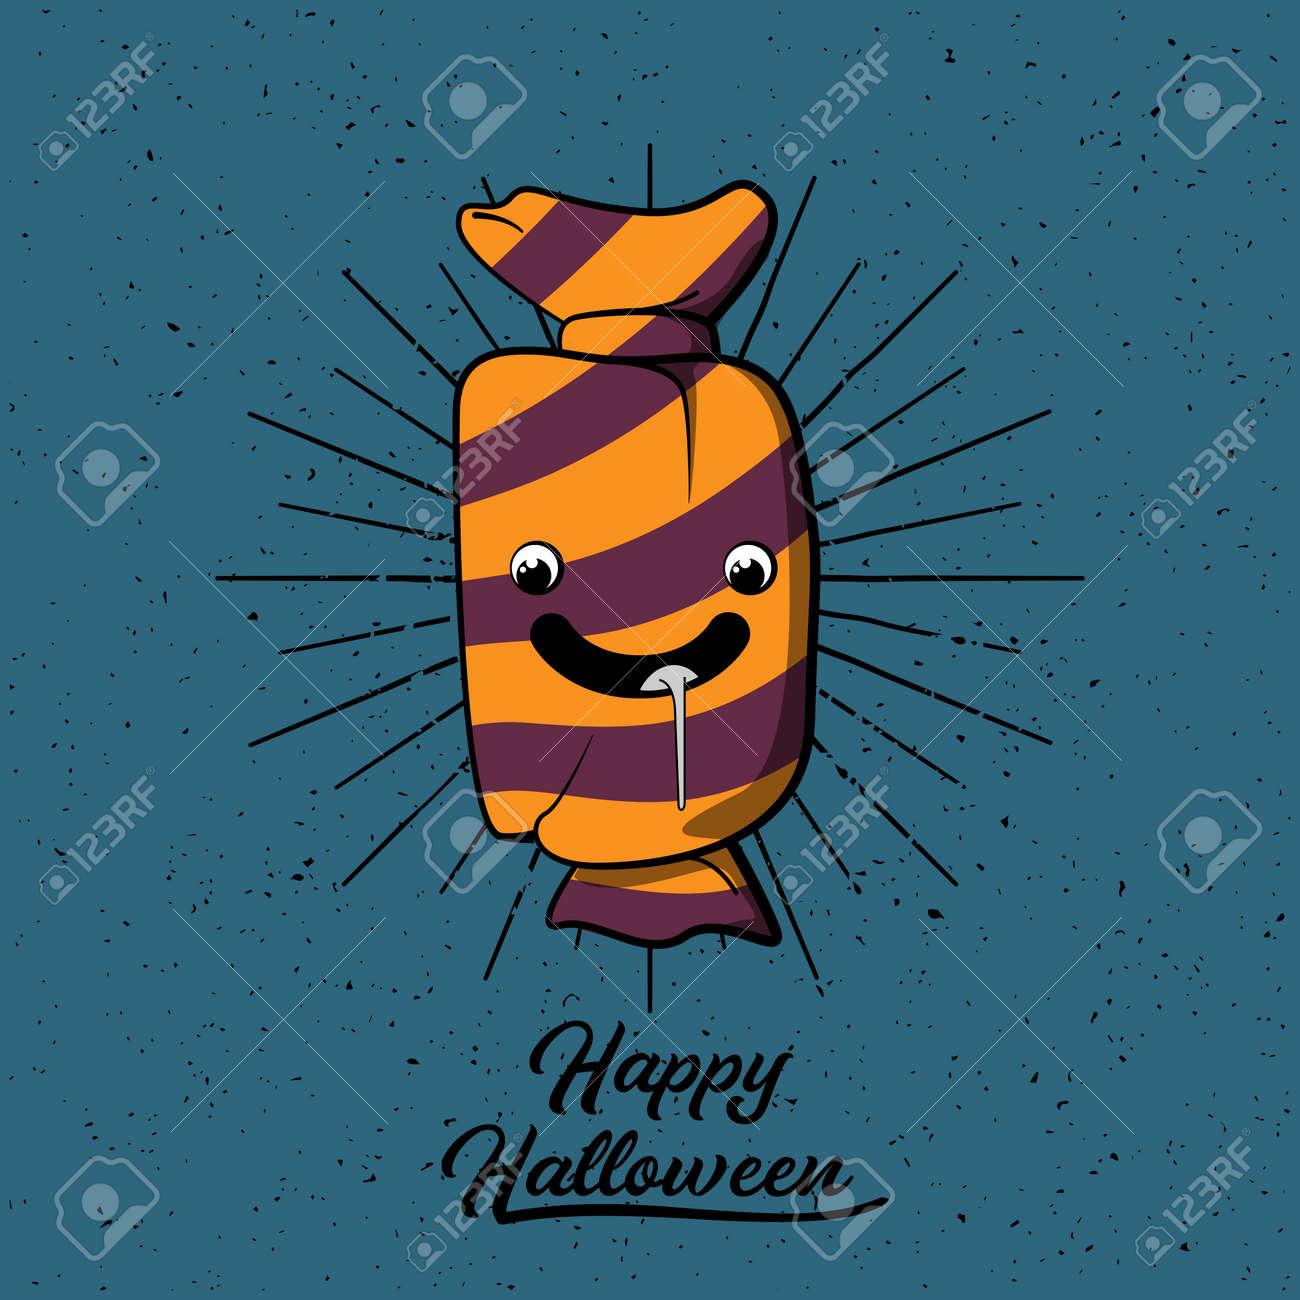 halloween candy cartoon happy halloween sign vector illustration rh 123rf com Halloween Moon Vector Halloween Silhouette